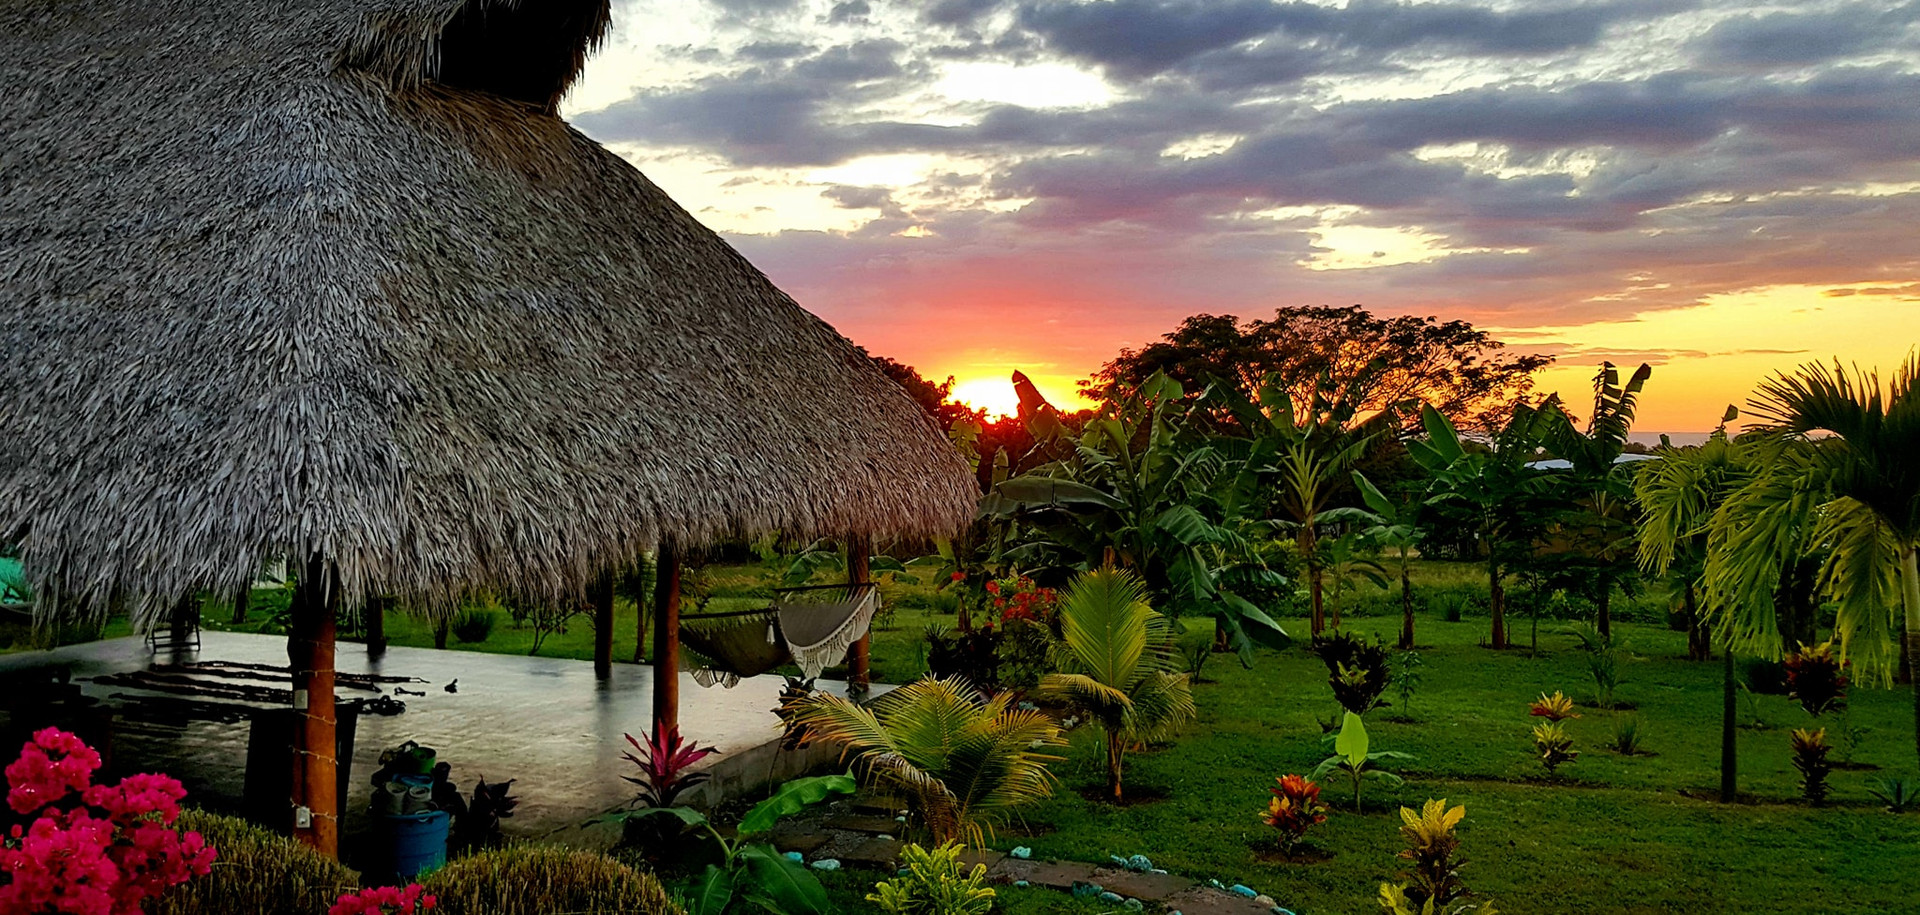 GLO Yoga Hut at Sunset